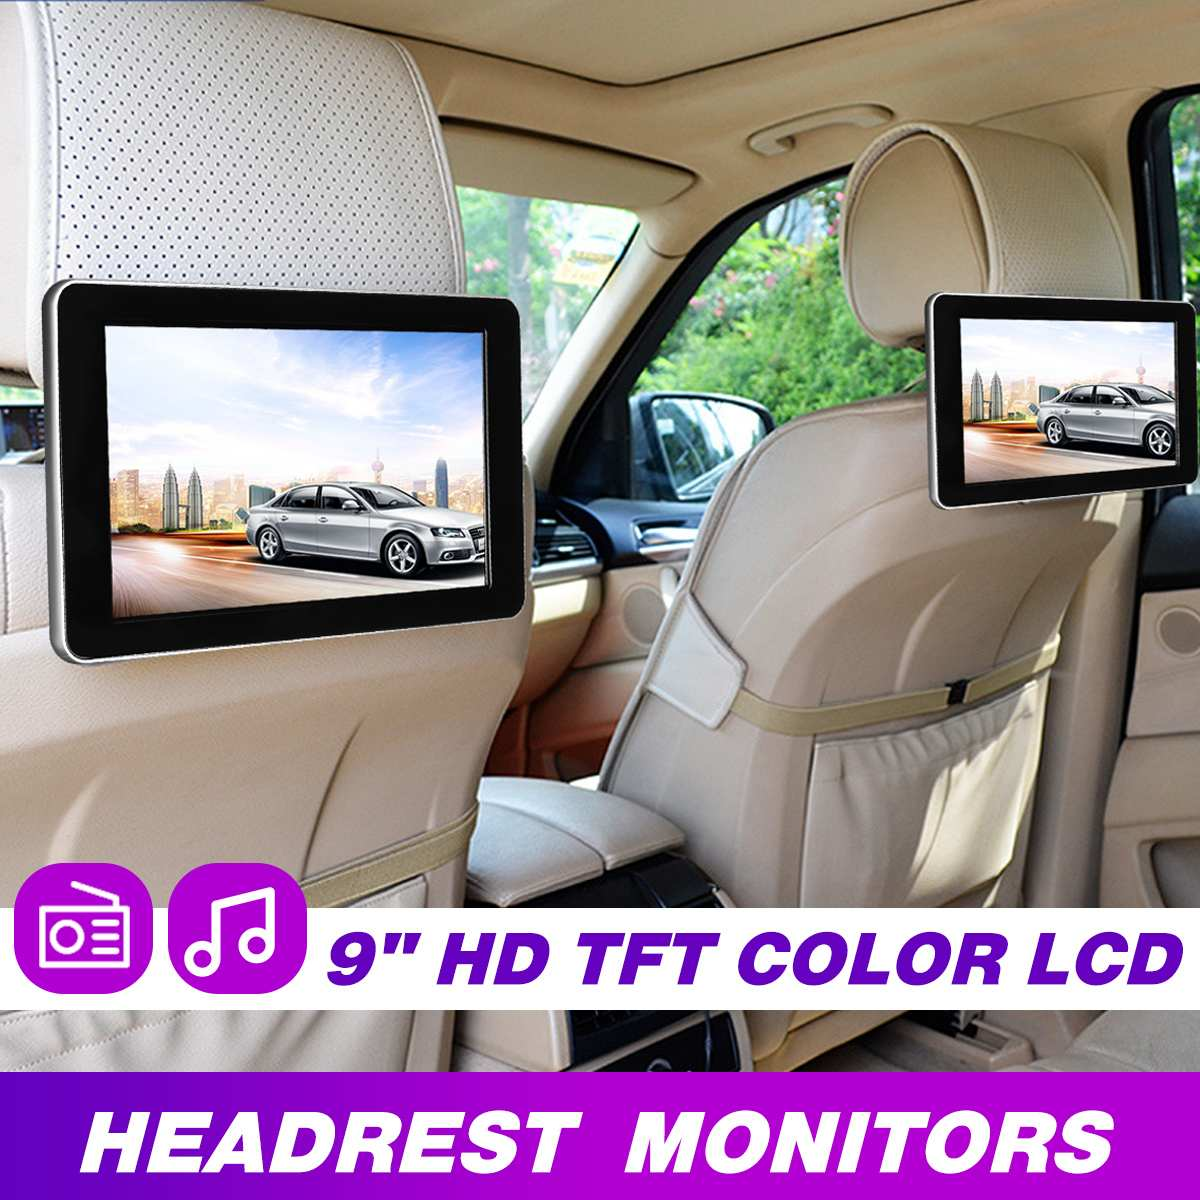 9 Inch Car HD Headrest Audio Monitor TFT Color LCD Display Digital Screen AV Input Radio Support Backup Camera MP5 Player